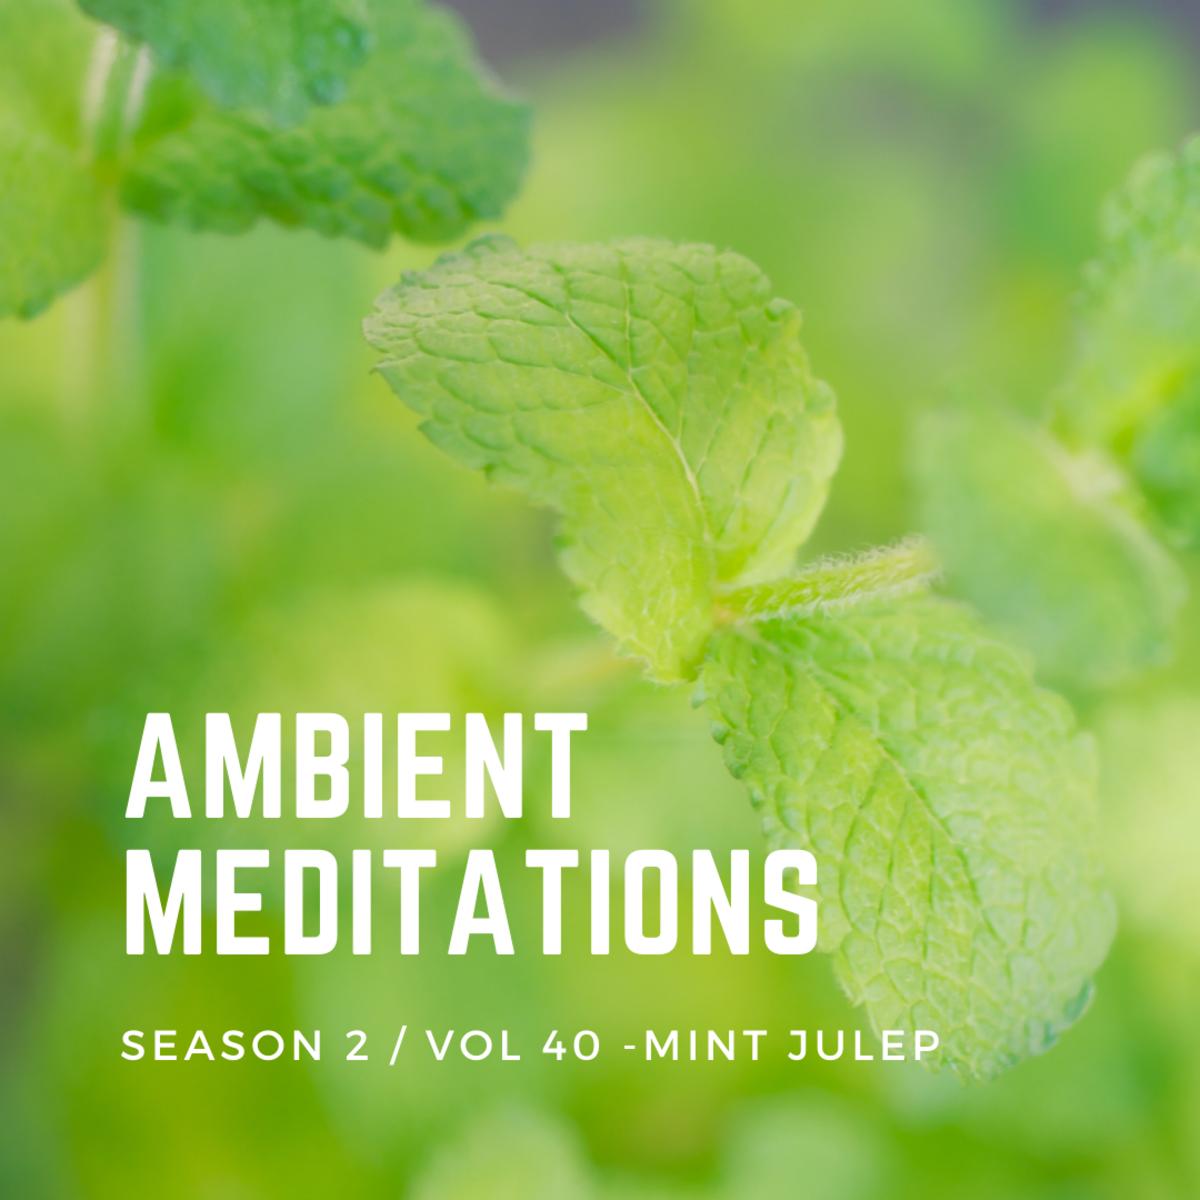 Ambient Meditations Season 2 - Vol 40 - Mint Julep